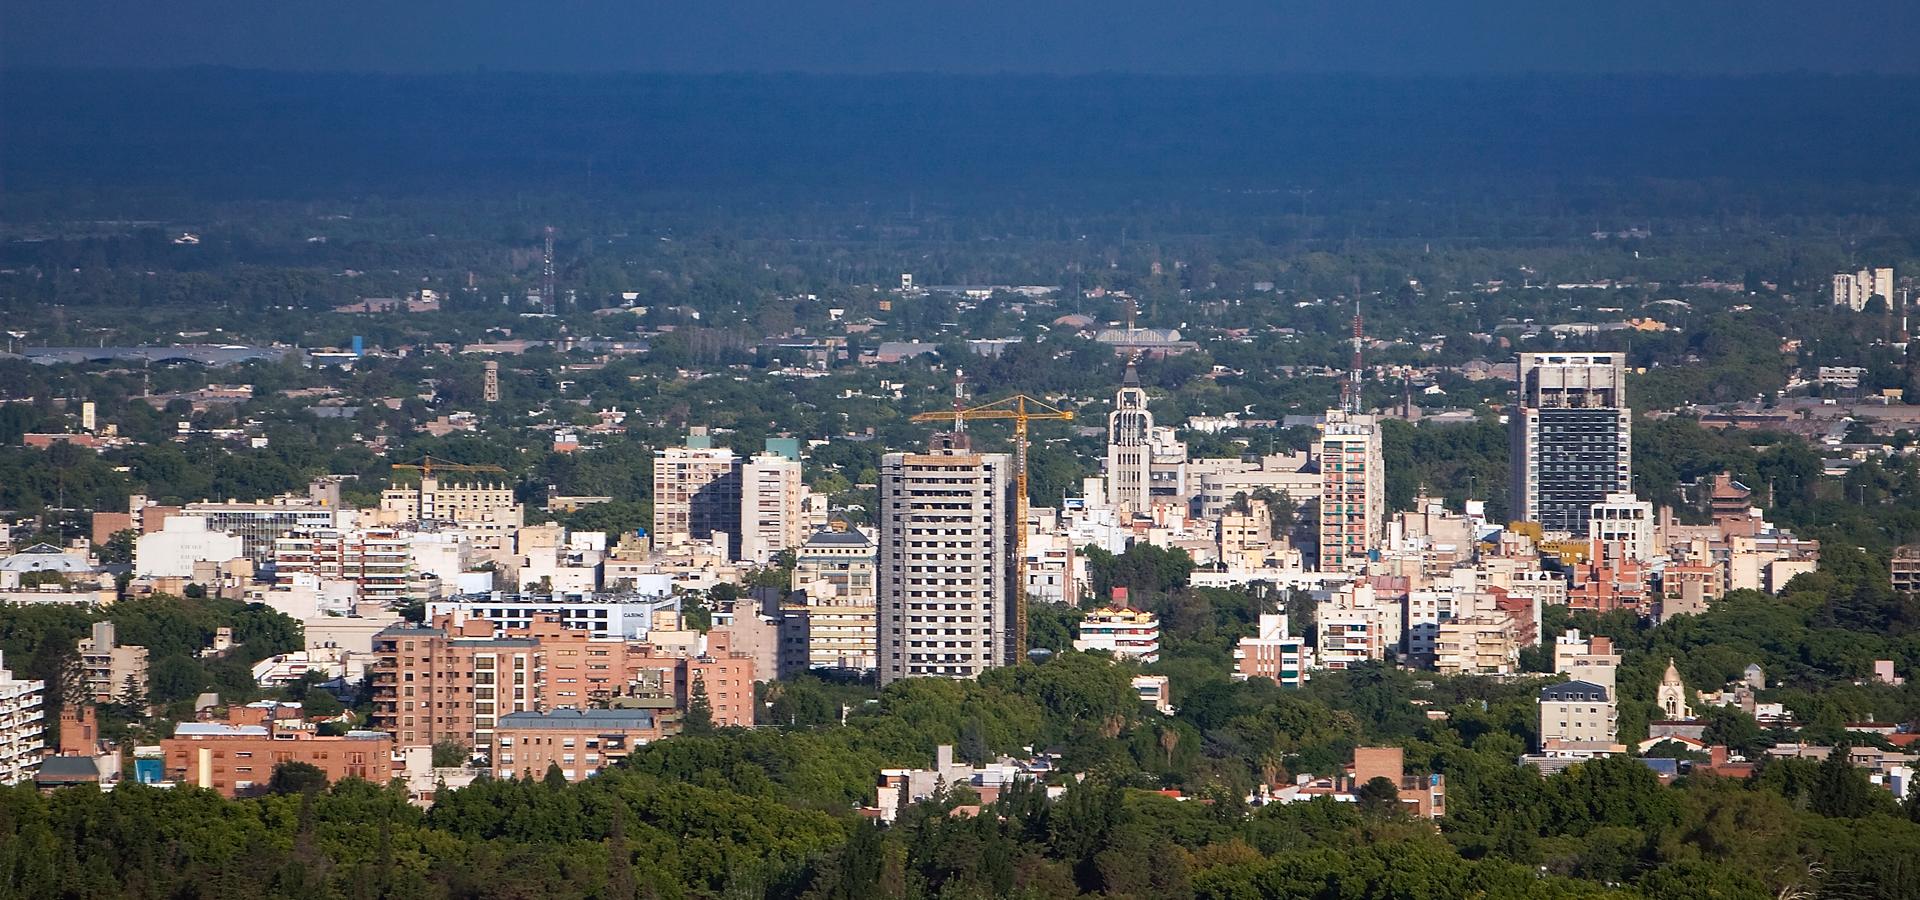 Peer-to-peer advisory in Mendoza, Argentina